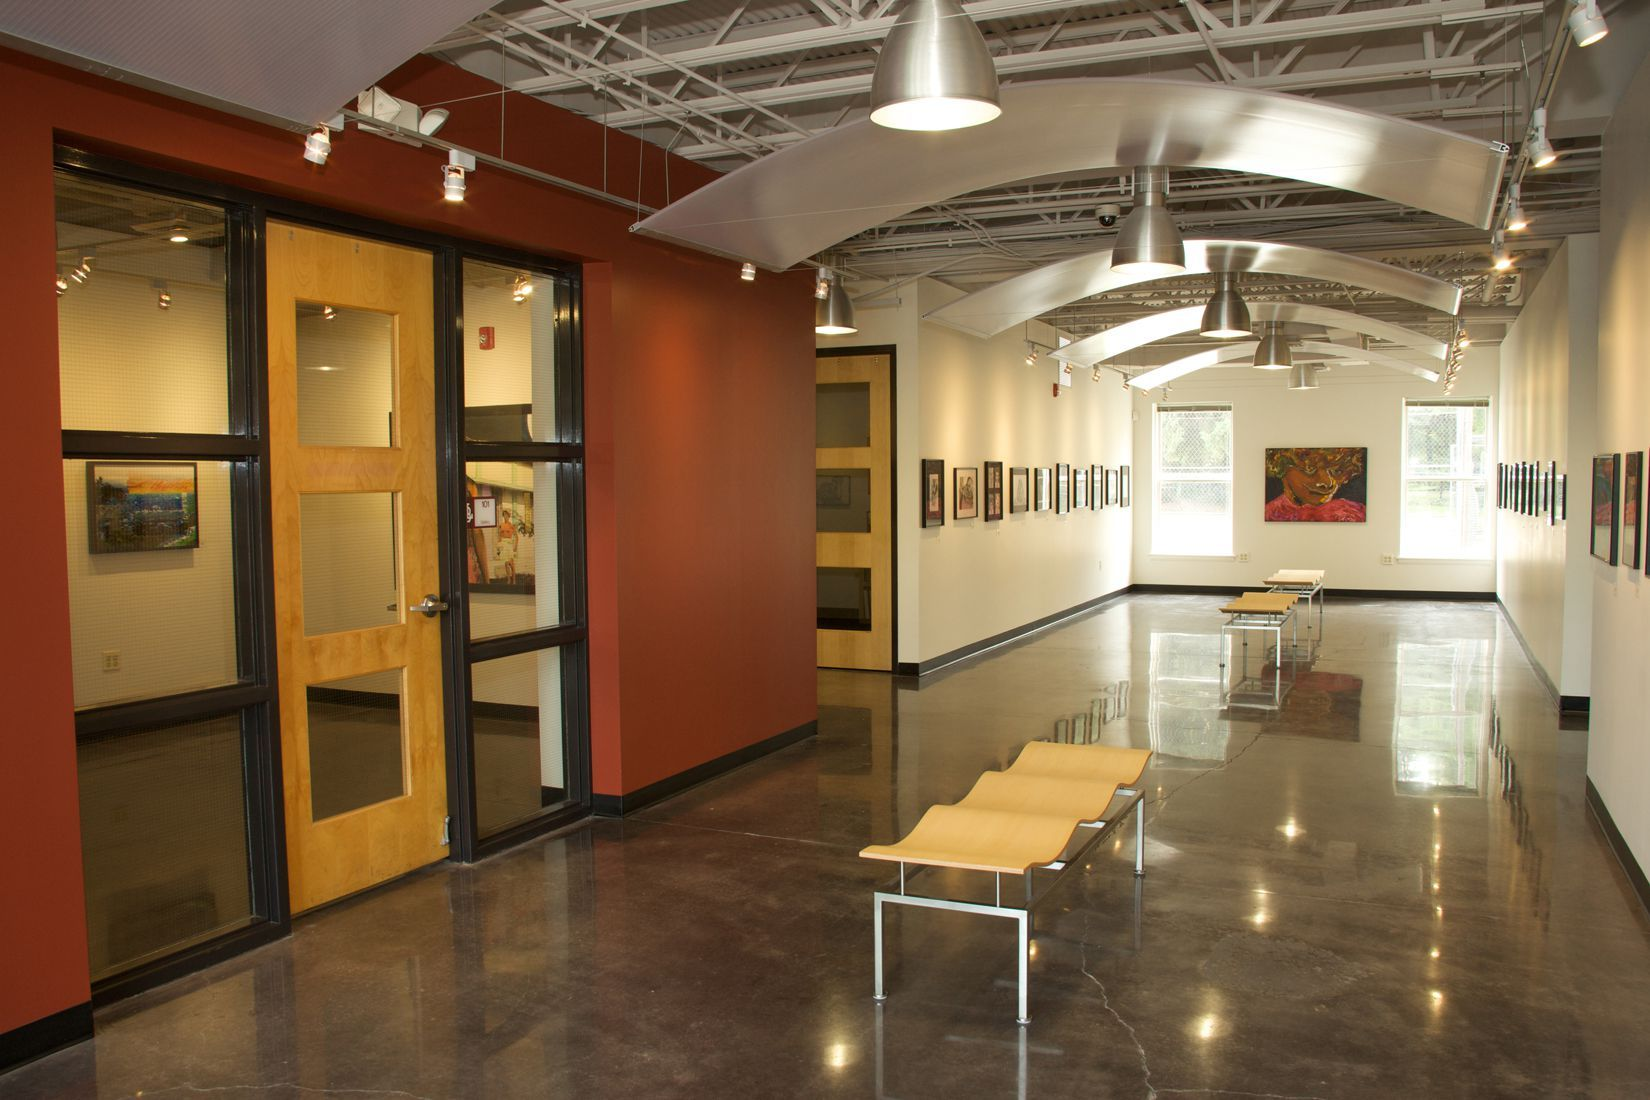 interior design schools in maryland http gandum xyz 072619